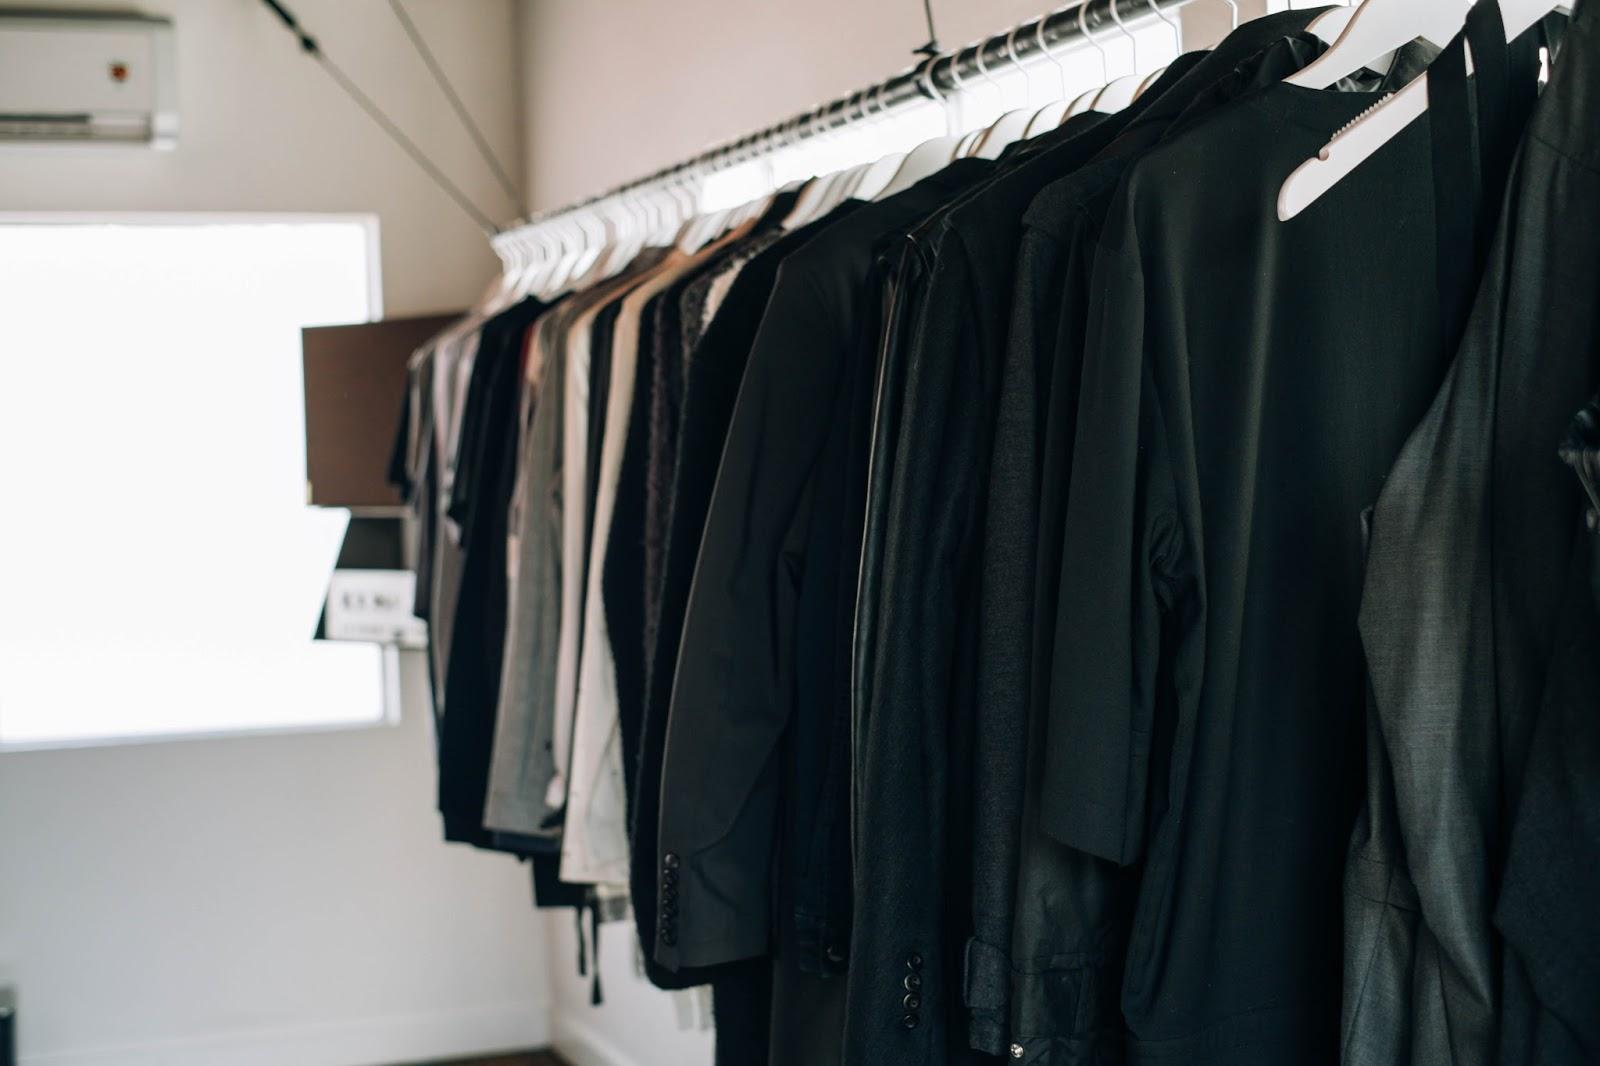 mybelonging-chapter-studio-menswear-losangeles-17.jpg